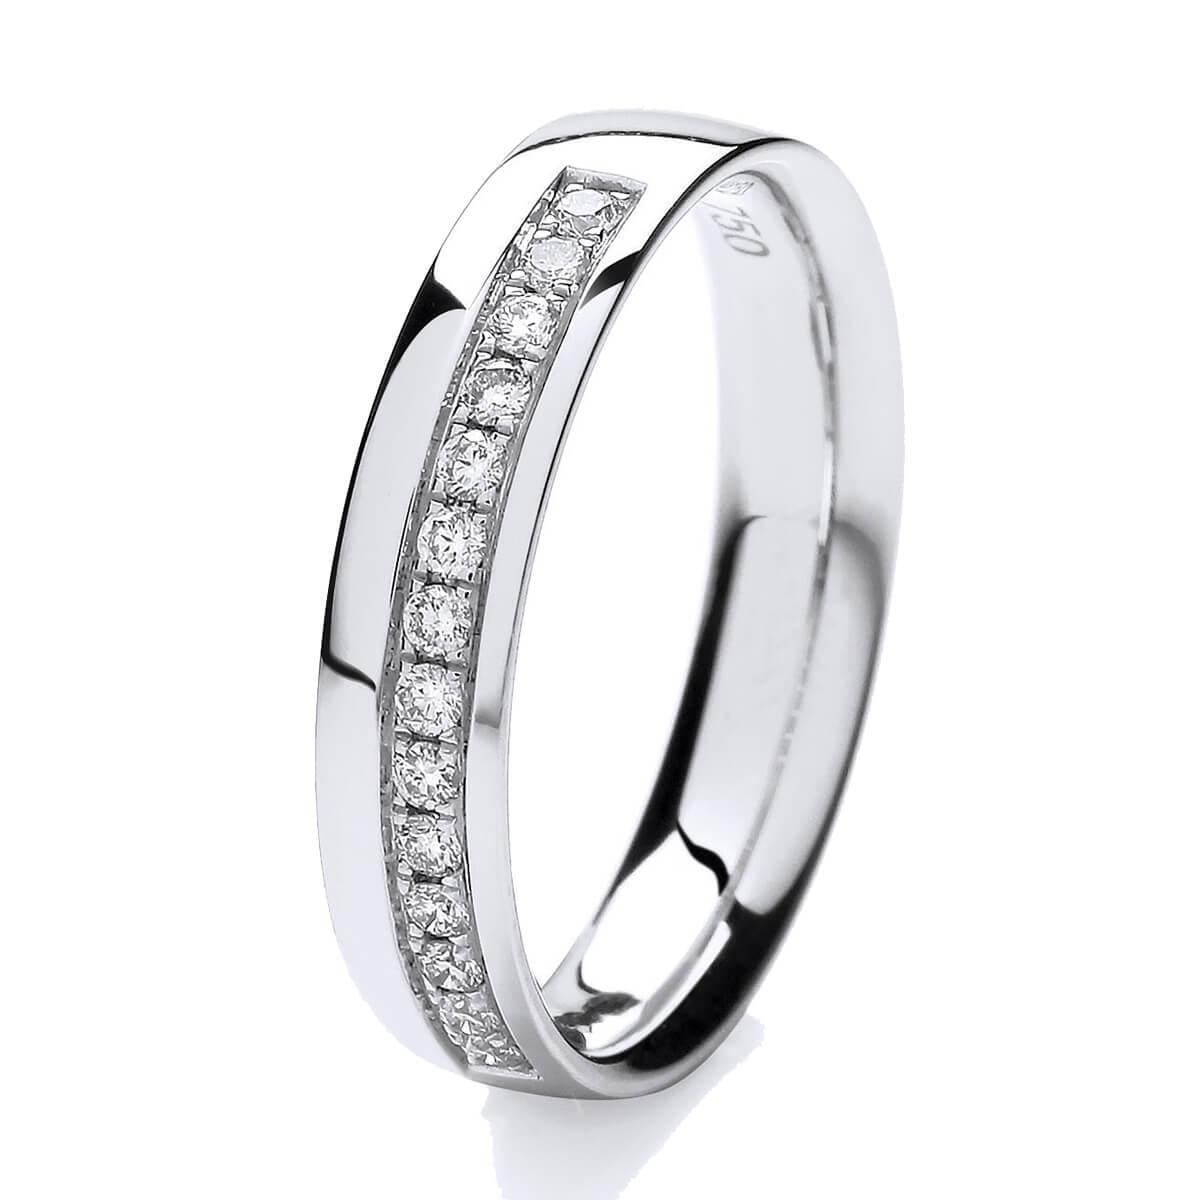 18ct White Gold Grain Set Diamond Wedding Ring